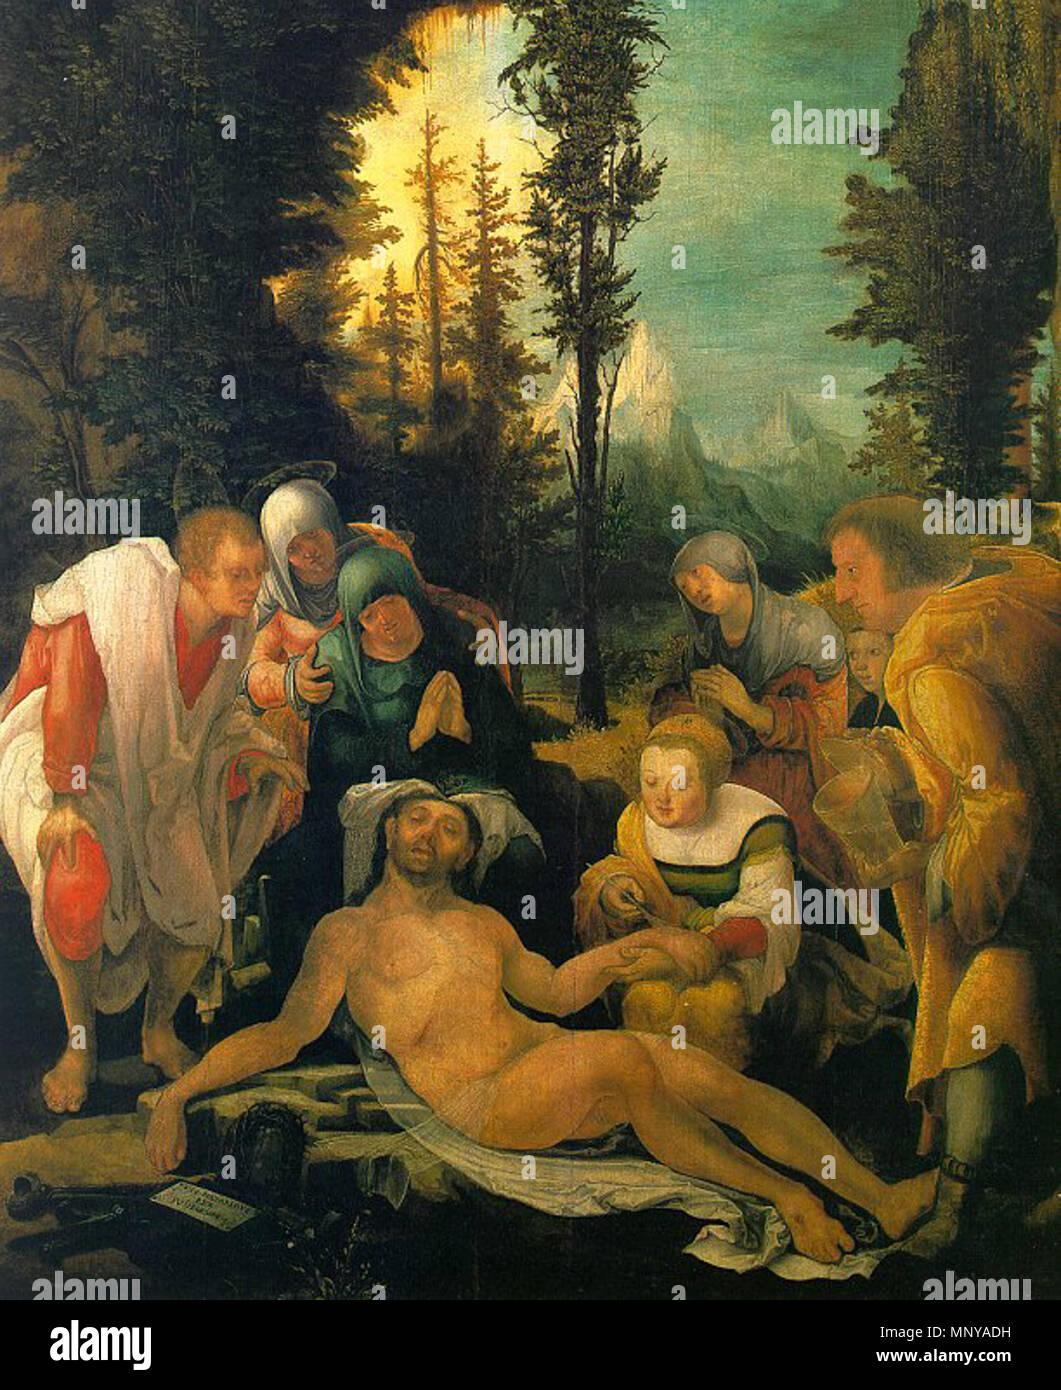 Wolf Huber Um 1485 Feldkirch 1553 Passau Wien